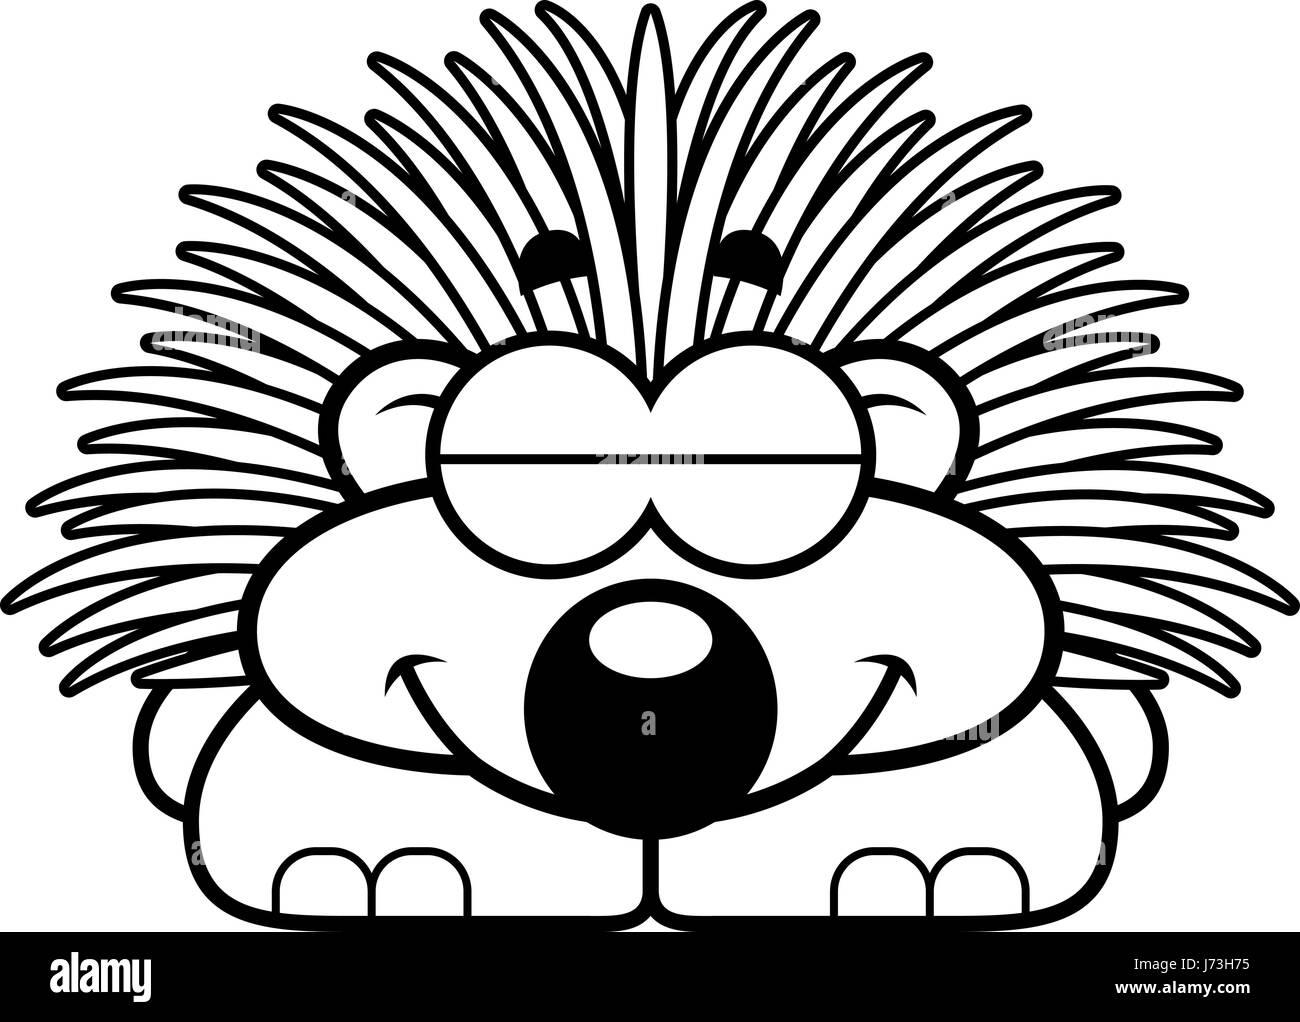 the porcupine black and white stock photos u0026 images alamy